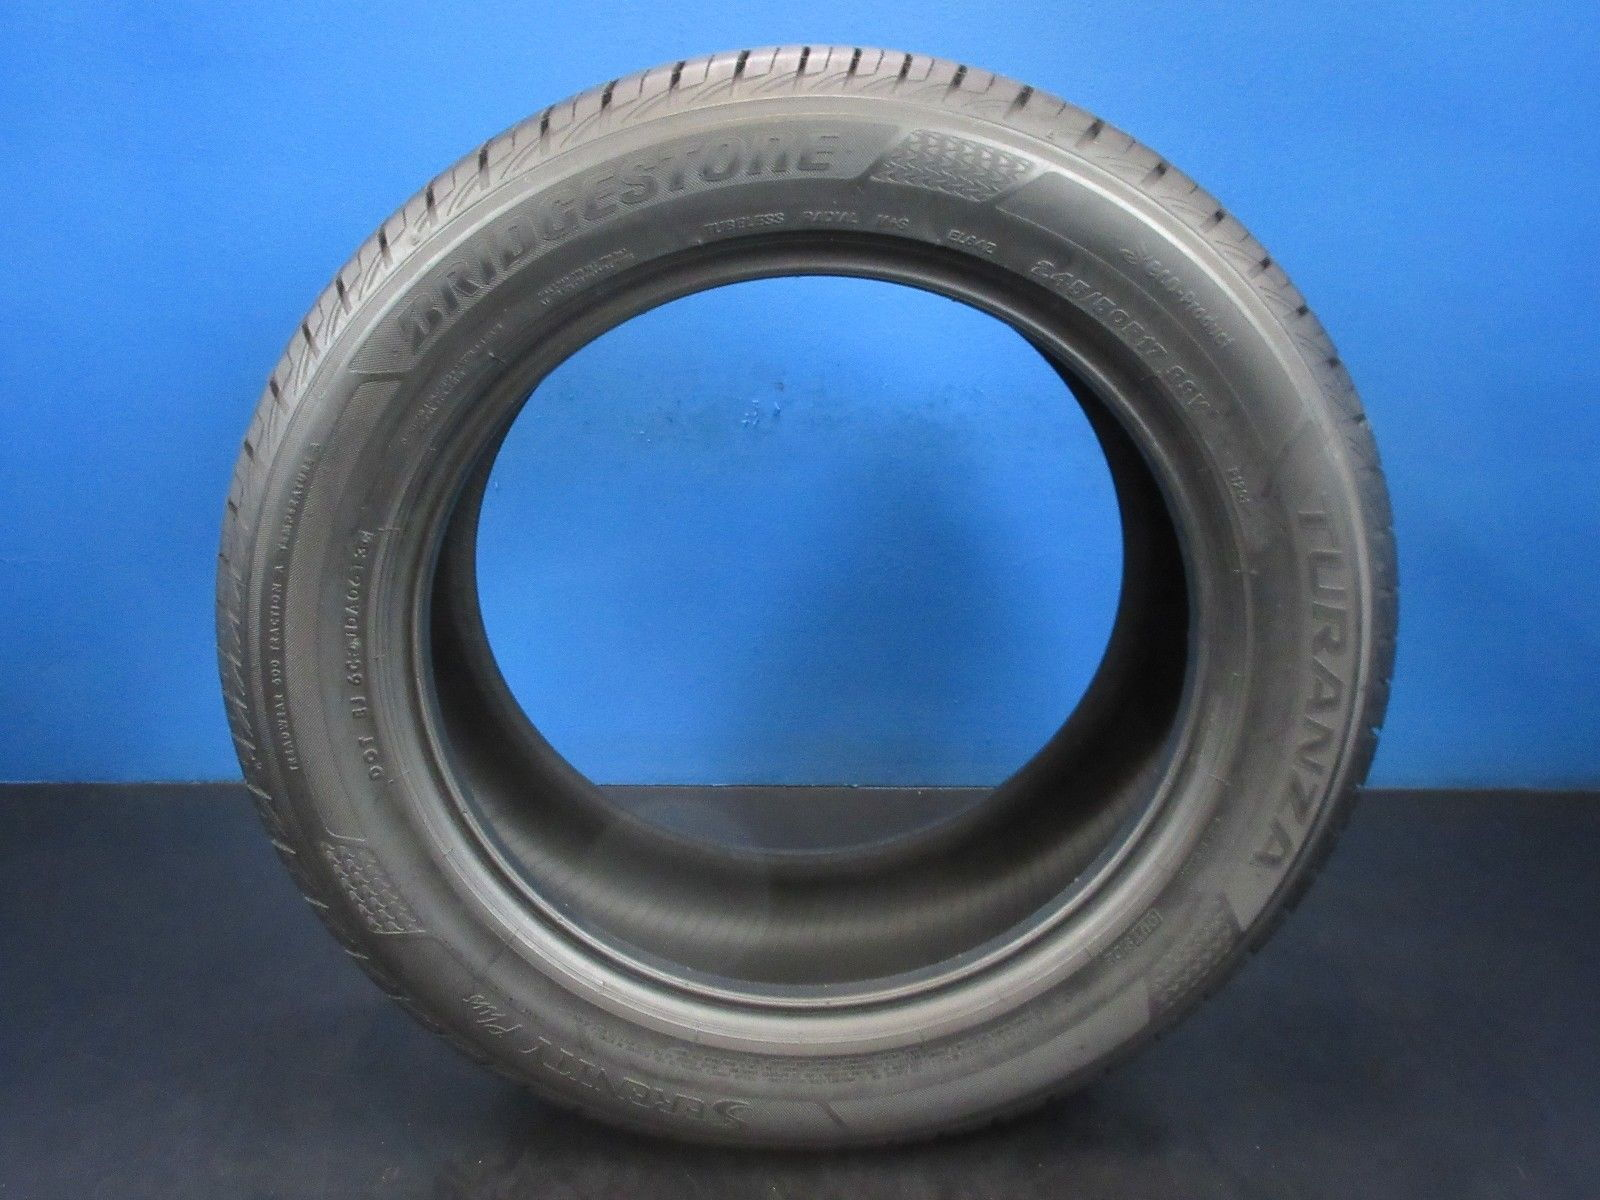 Bridgestone Turanza Serenity Plus >> Fs One Bridgestone Turanza Serenity Plus 245 50 17 Tire